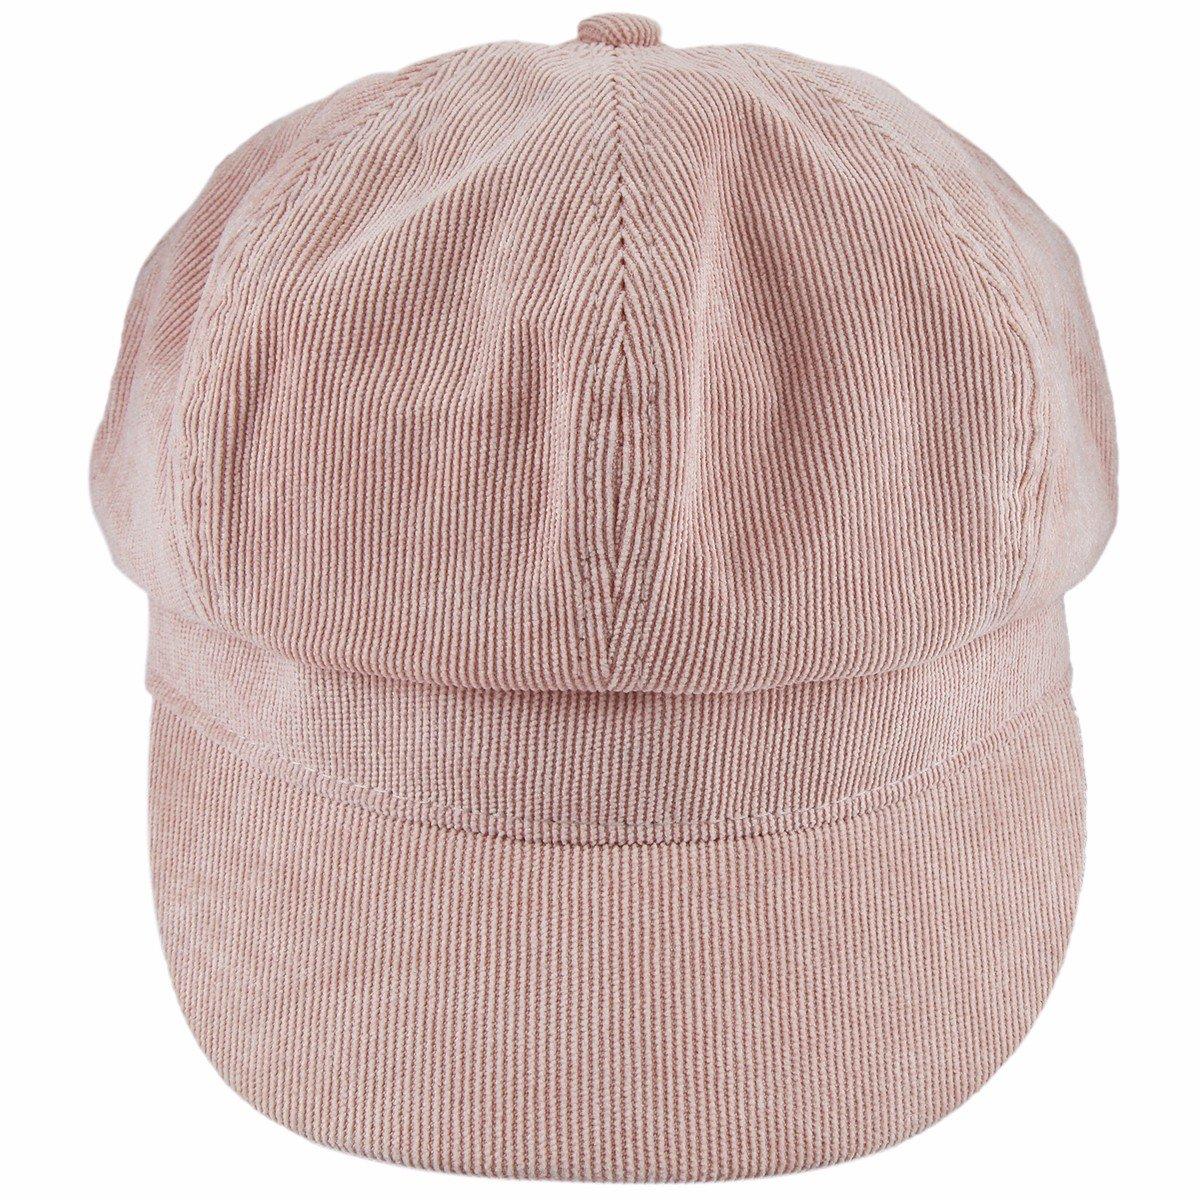 Samtree newsboy Cap For Women,8 Panel IVY Cabbie Beret Visor Brim Hat(Pink(Corduroy))